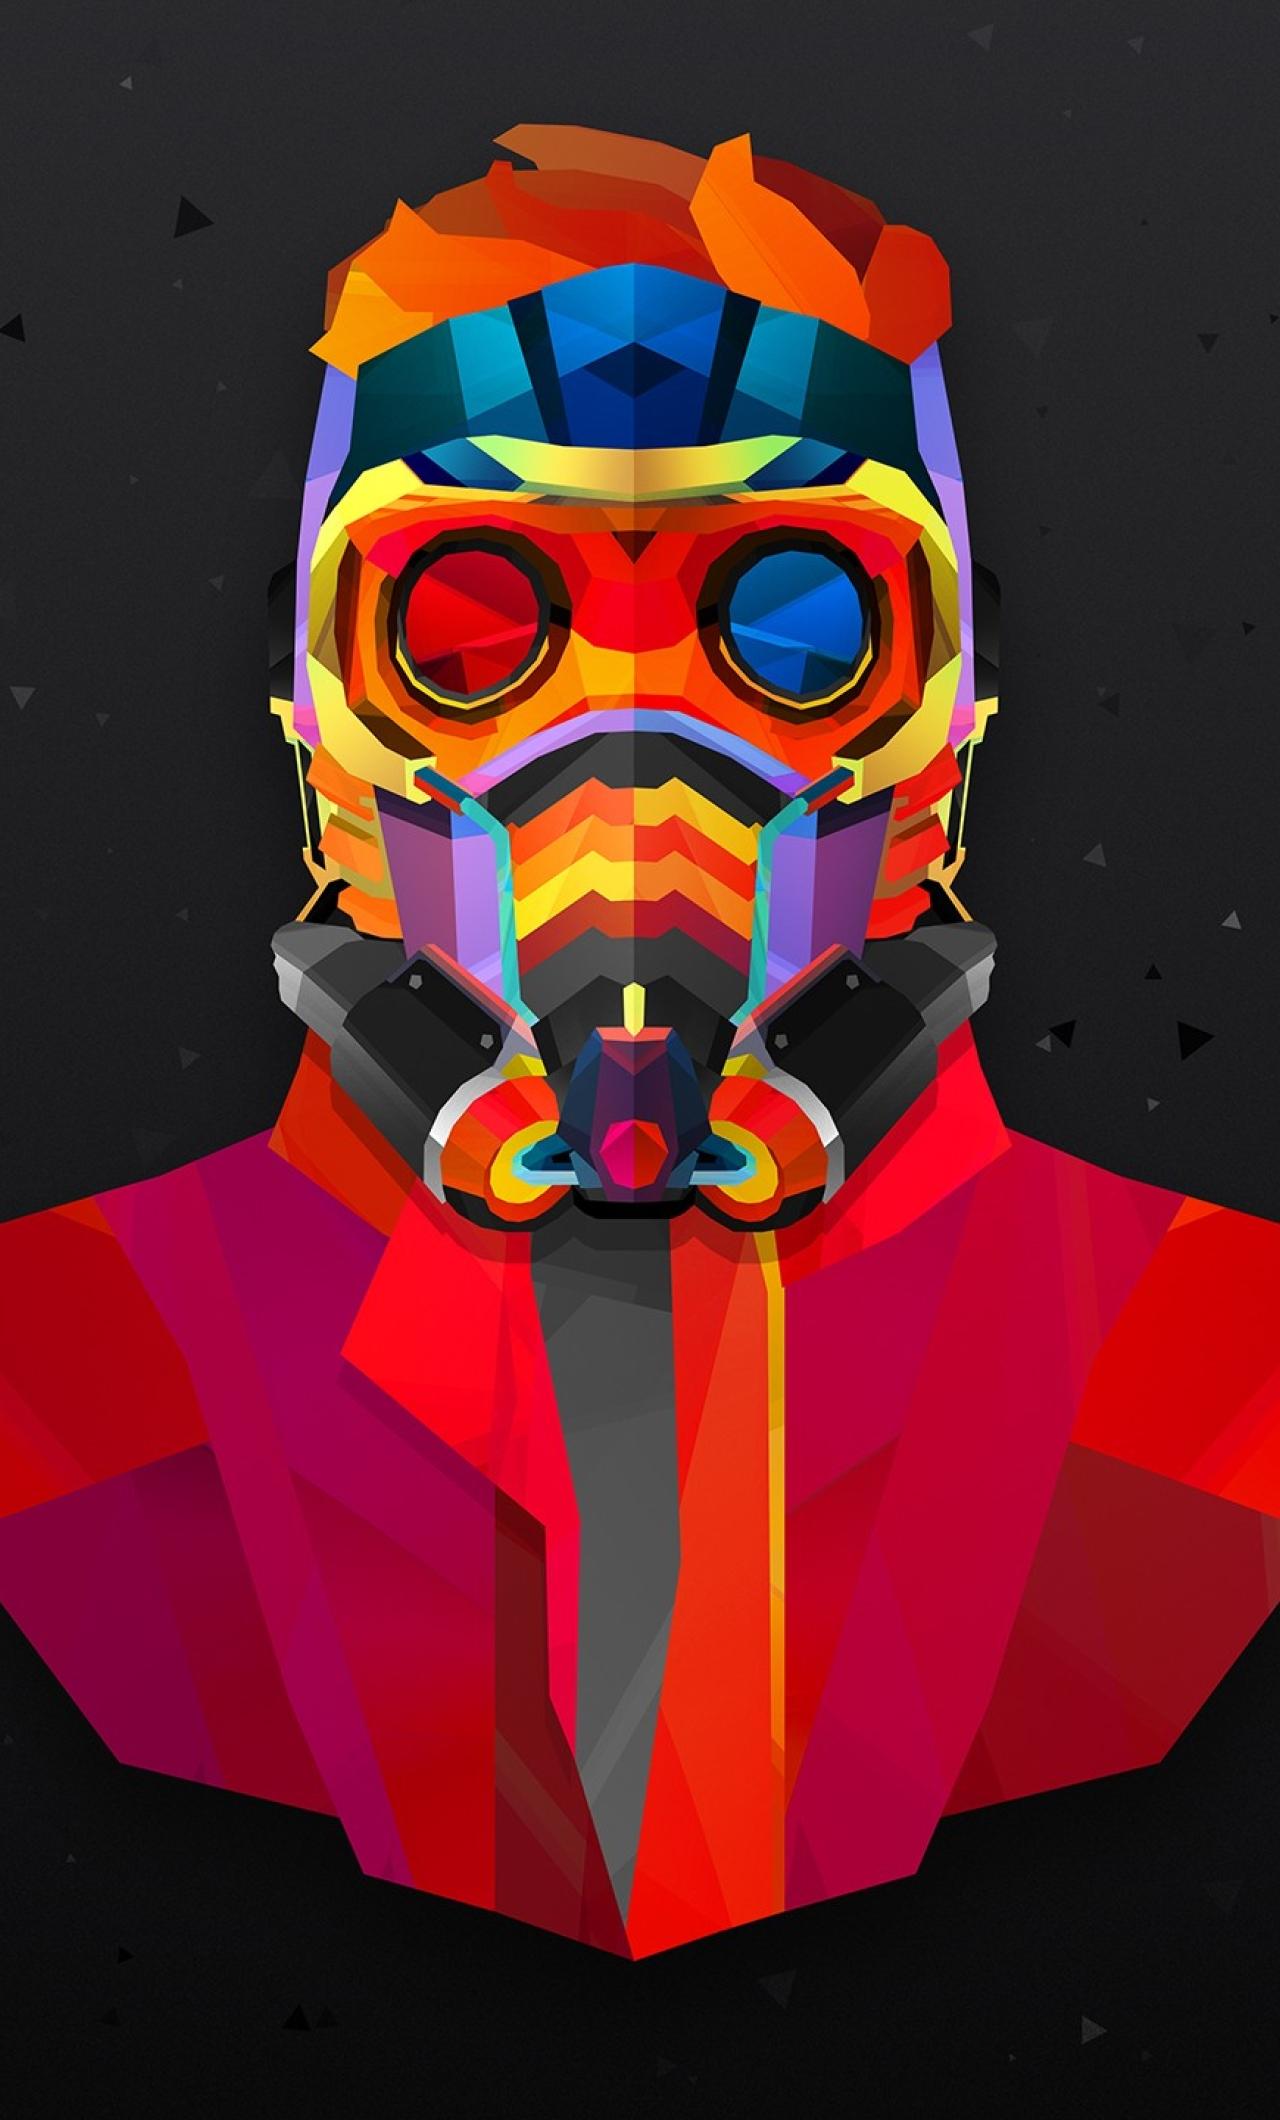 Star Lord Colorful, Full HD 2K Wallpaper